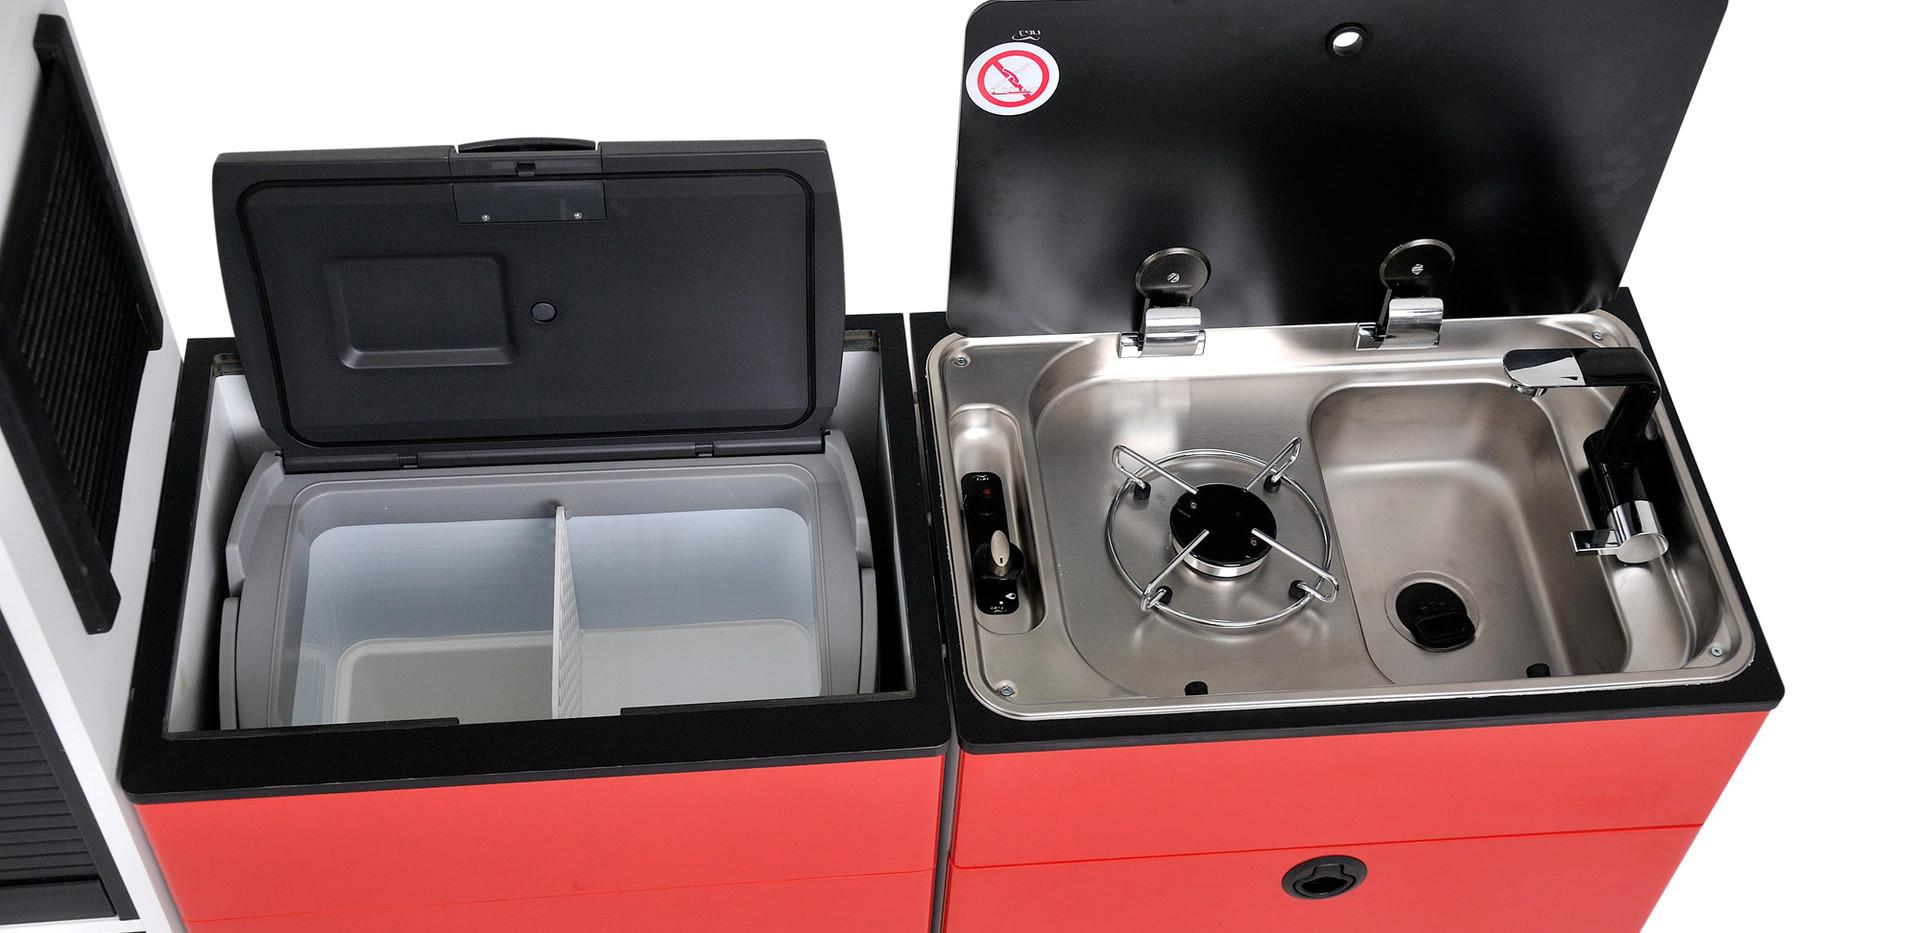 Модули кухня и холодильник